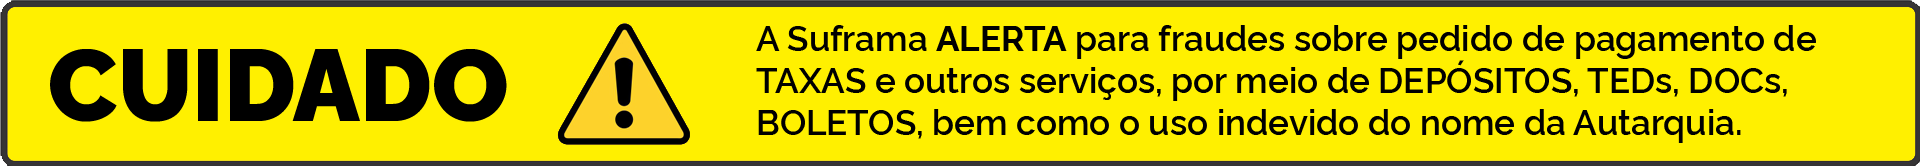 Banner de Alerta